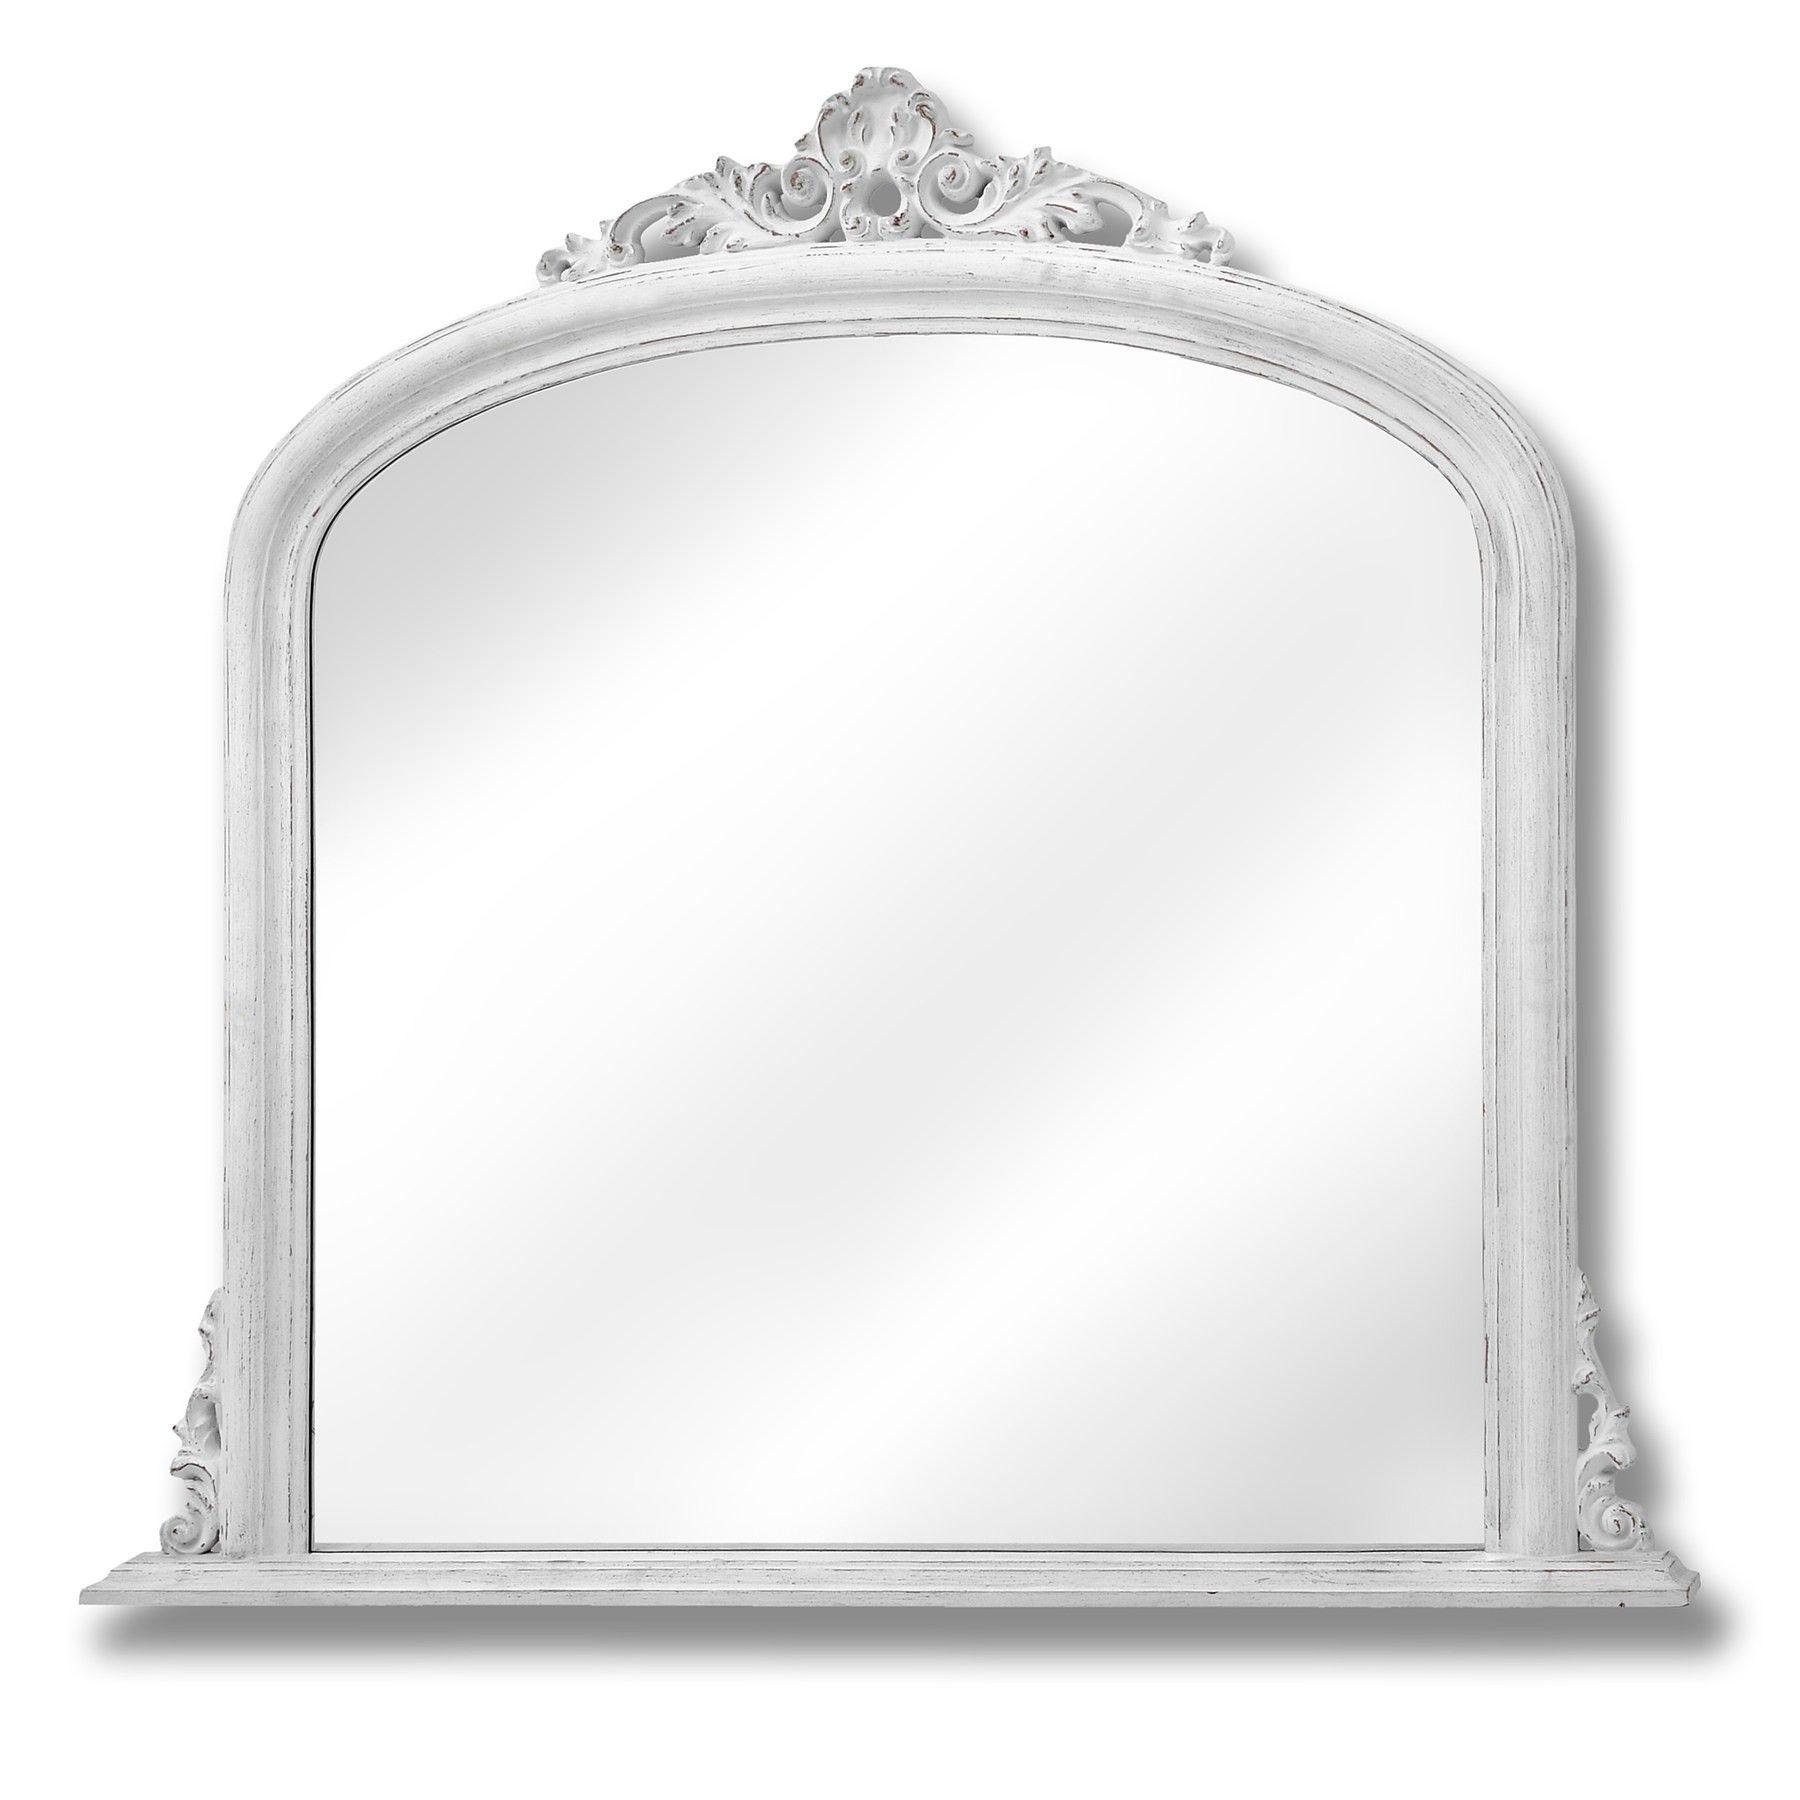 Denain Over Mantle Mirror Mantle Mirror Mantel Mirrors Overmantle Mirror